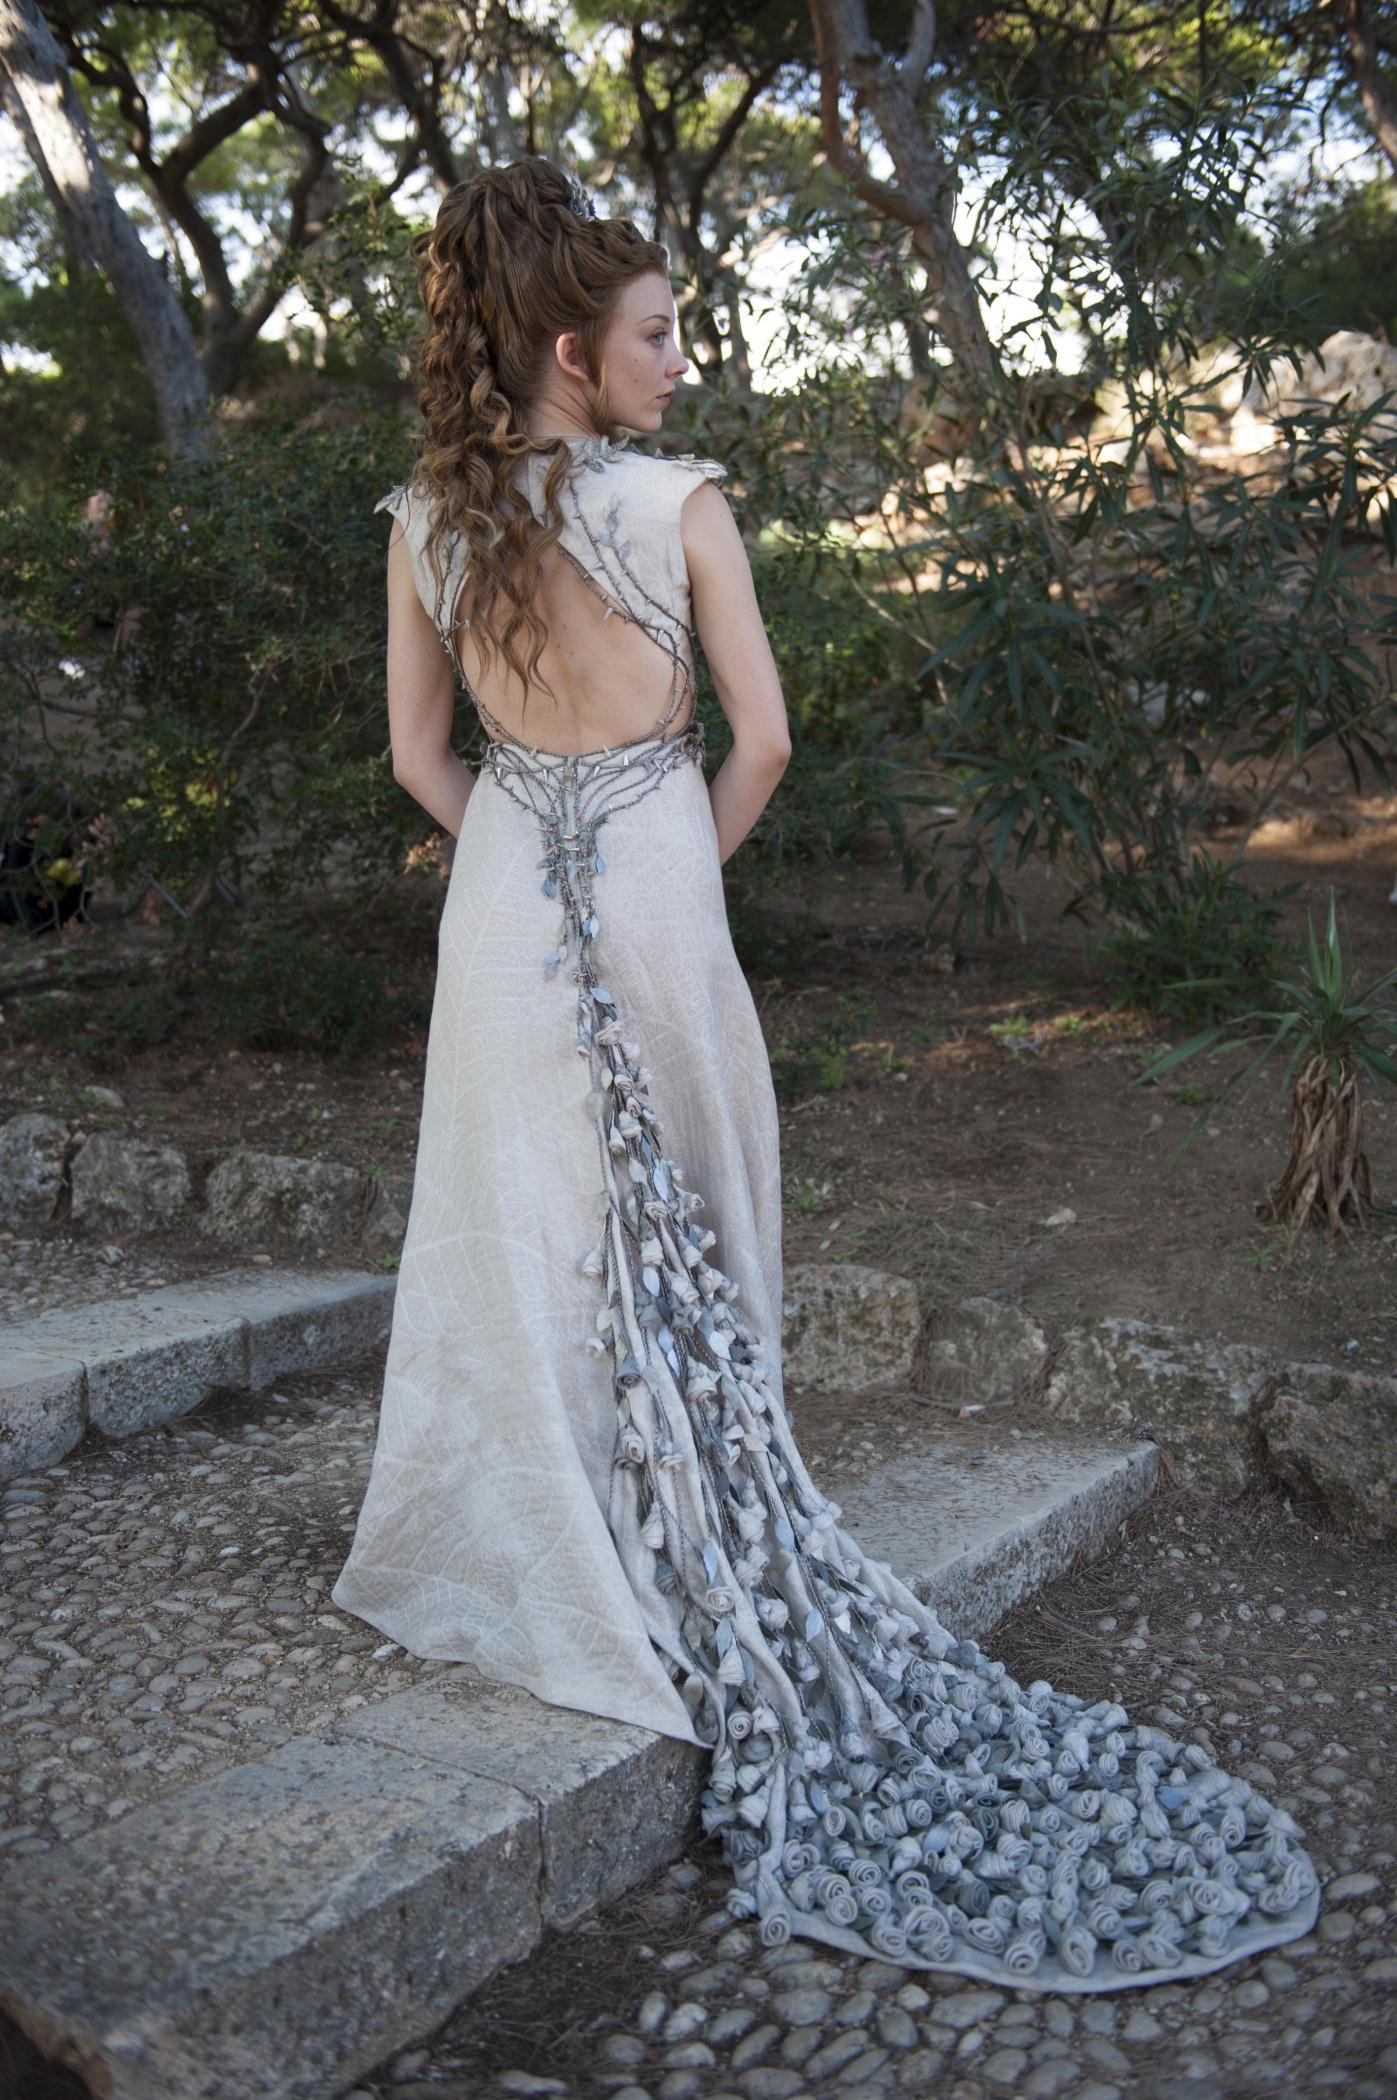 Natalie Dormer 'Game Of Thrones' Season 3 Premiere 2 Two ... |Natalie Dormer Game Of Thrones Dress